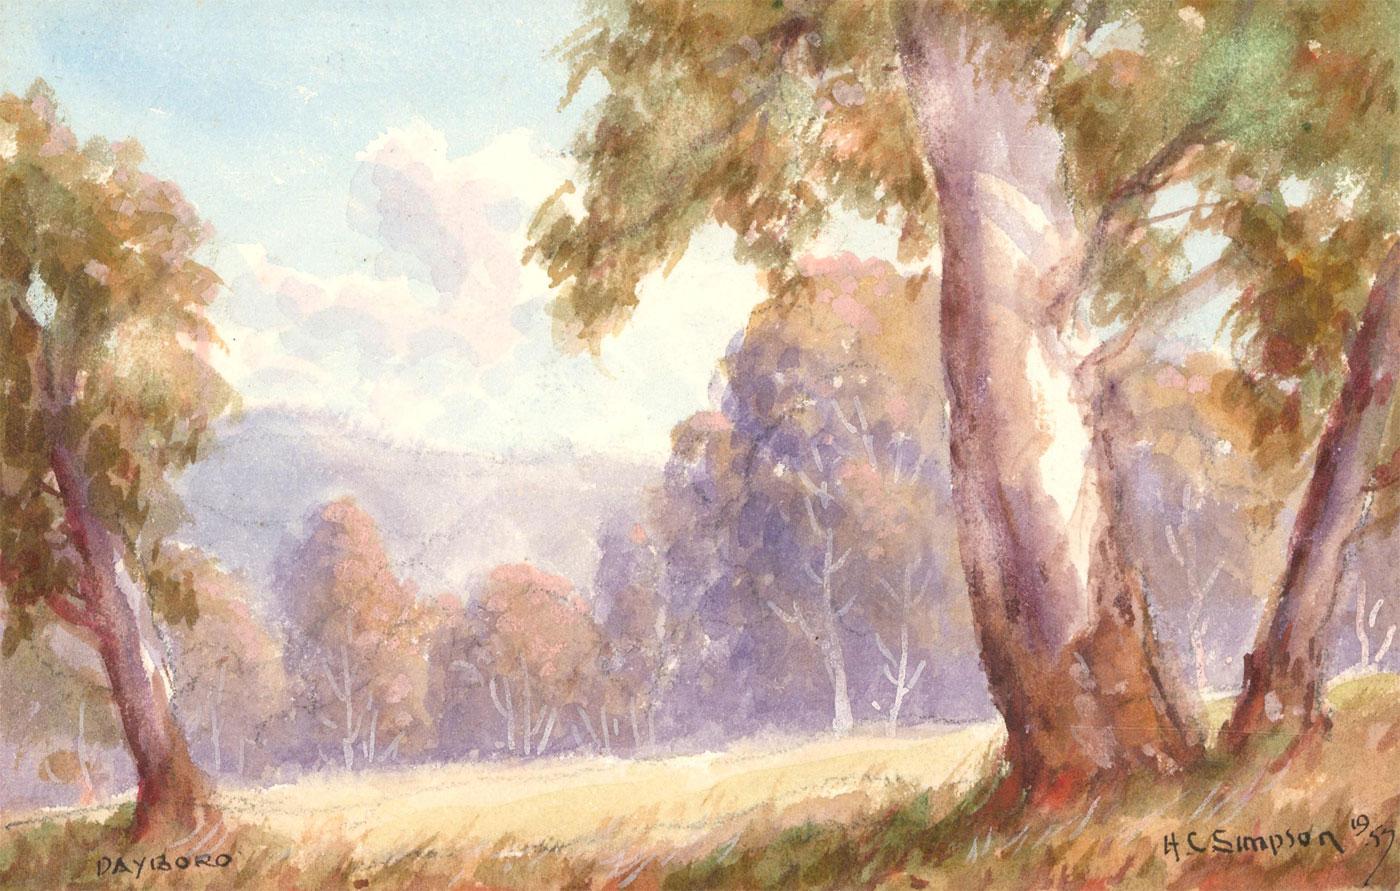 Herbert Clarke Simpson (1879-1966) - 1957 Watercolour, Landscape with Trees